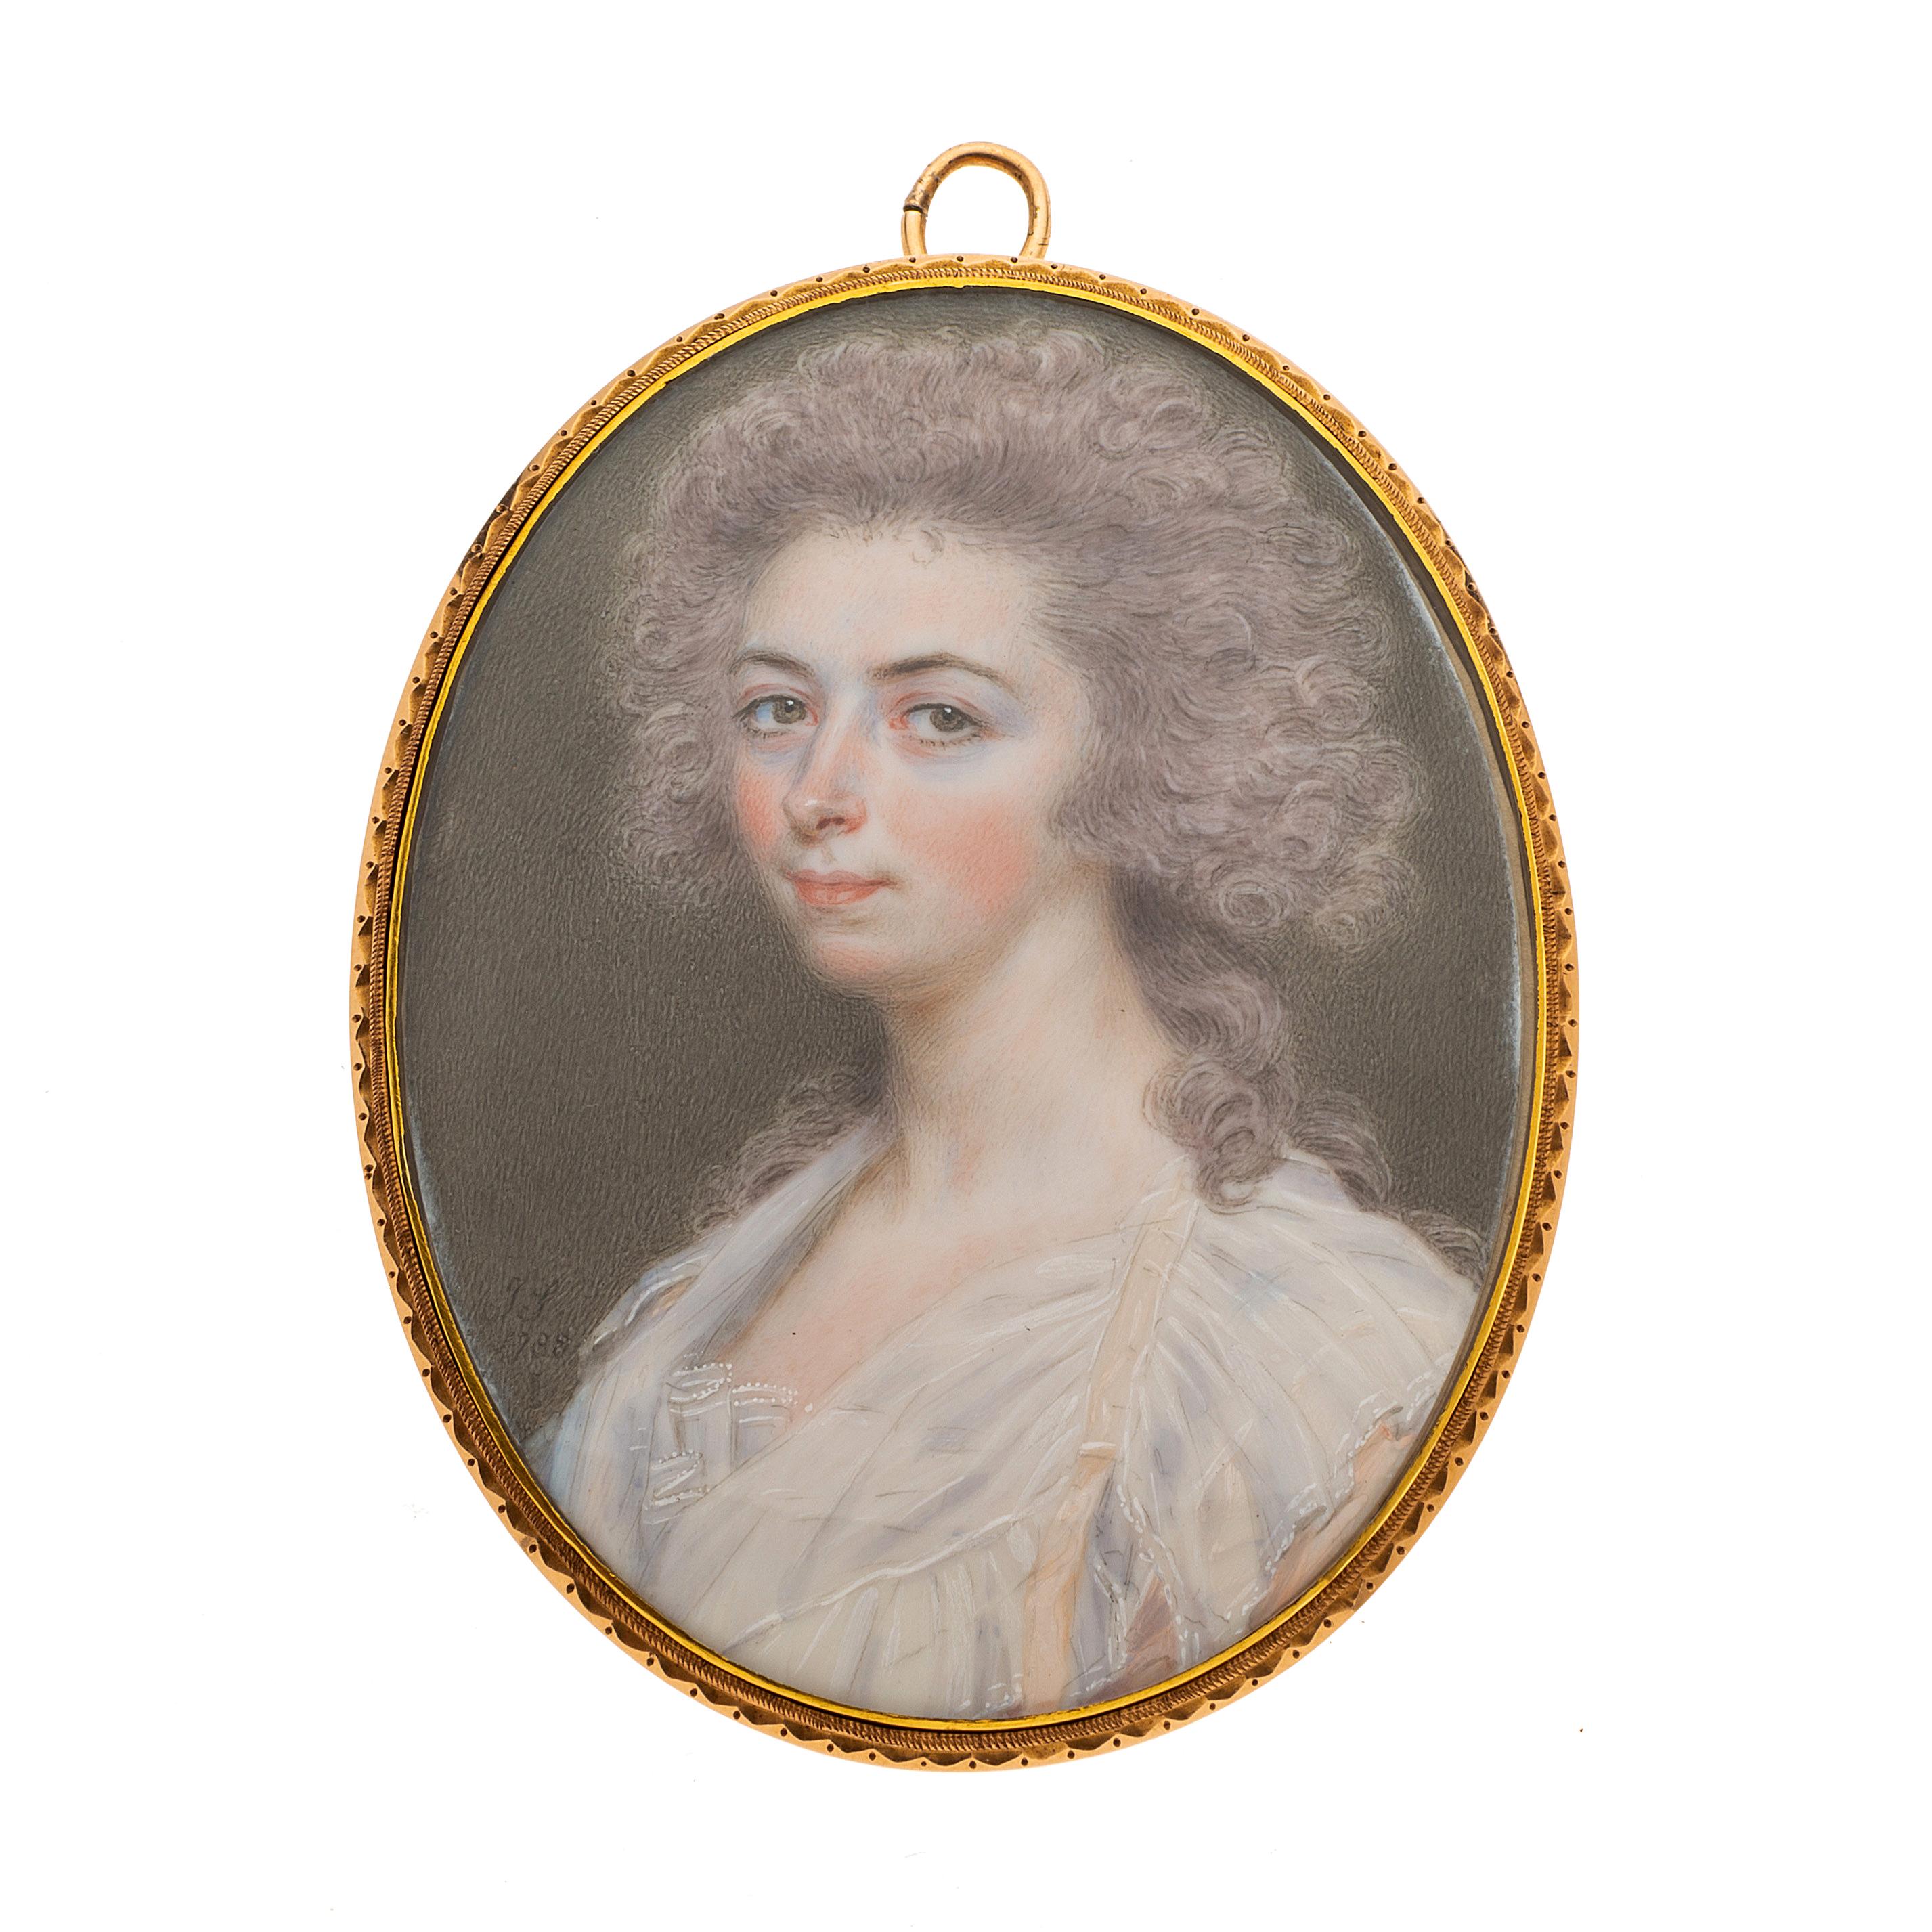 John Smart (1742/ 43-1811), a gold portrait miniature pendant, dated 1788